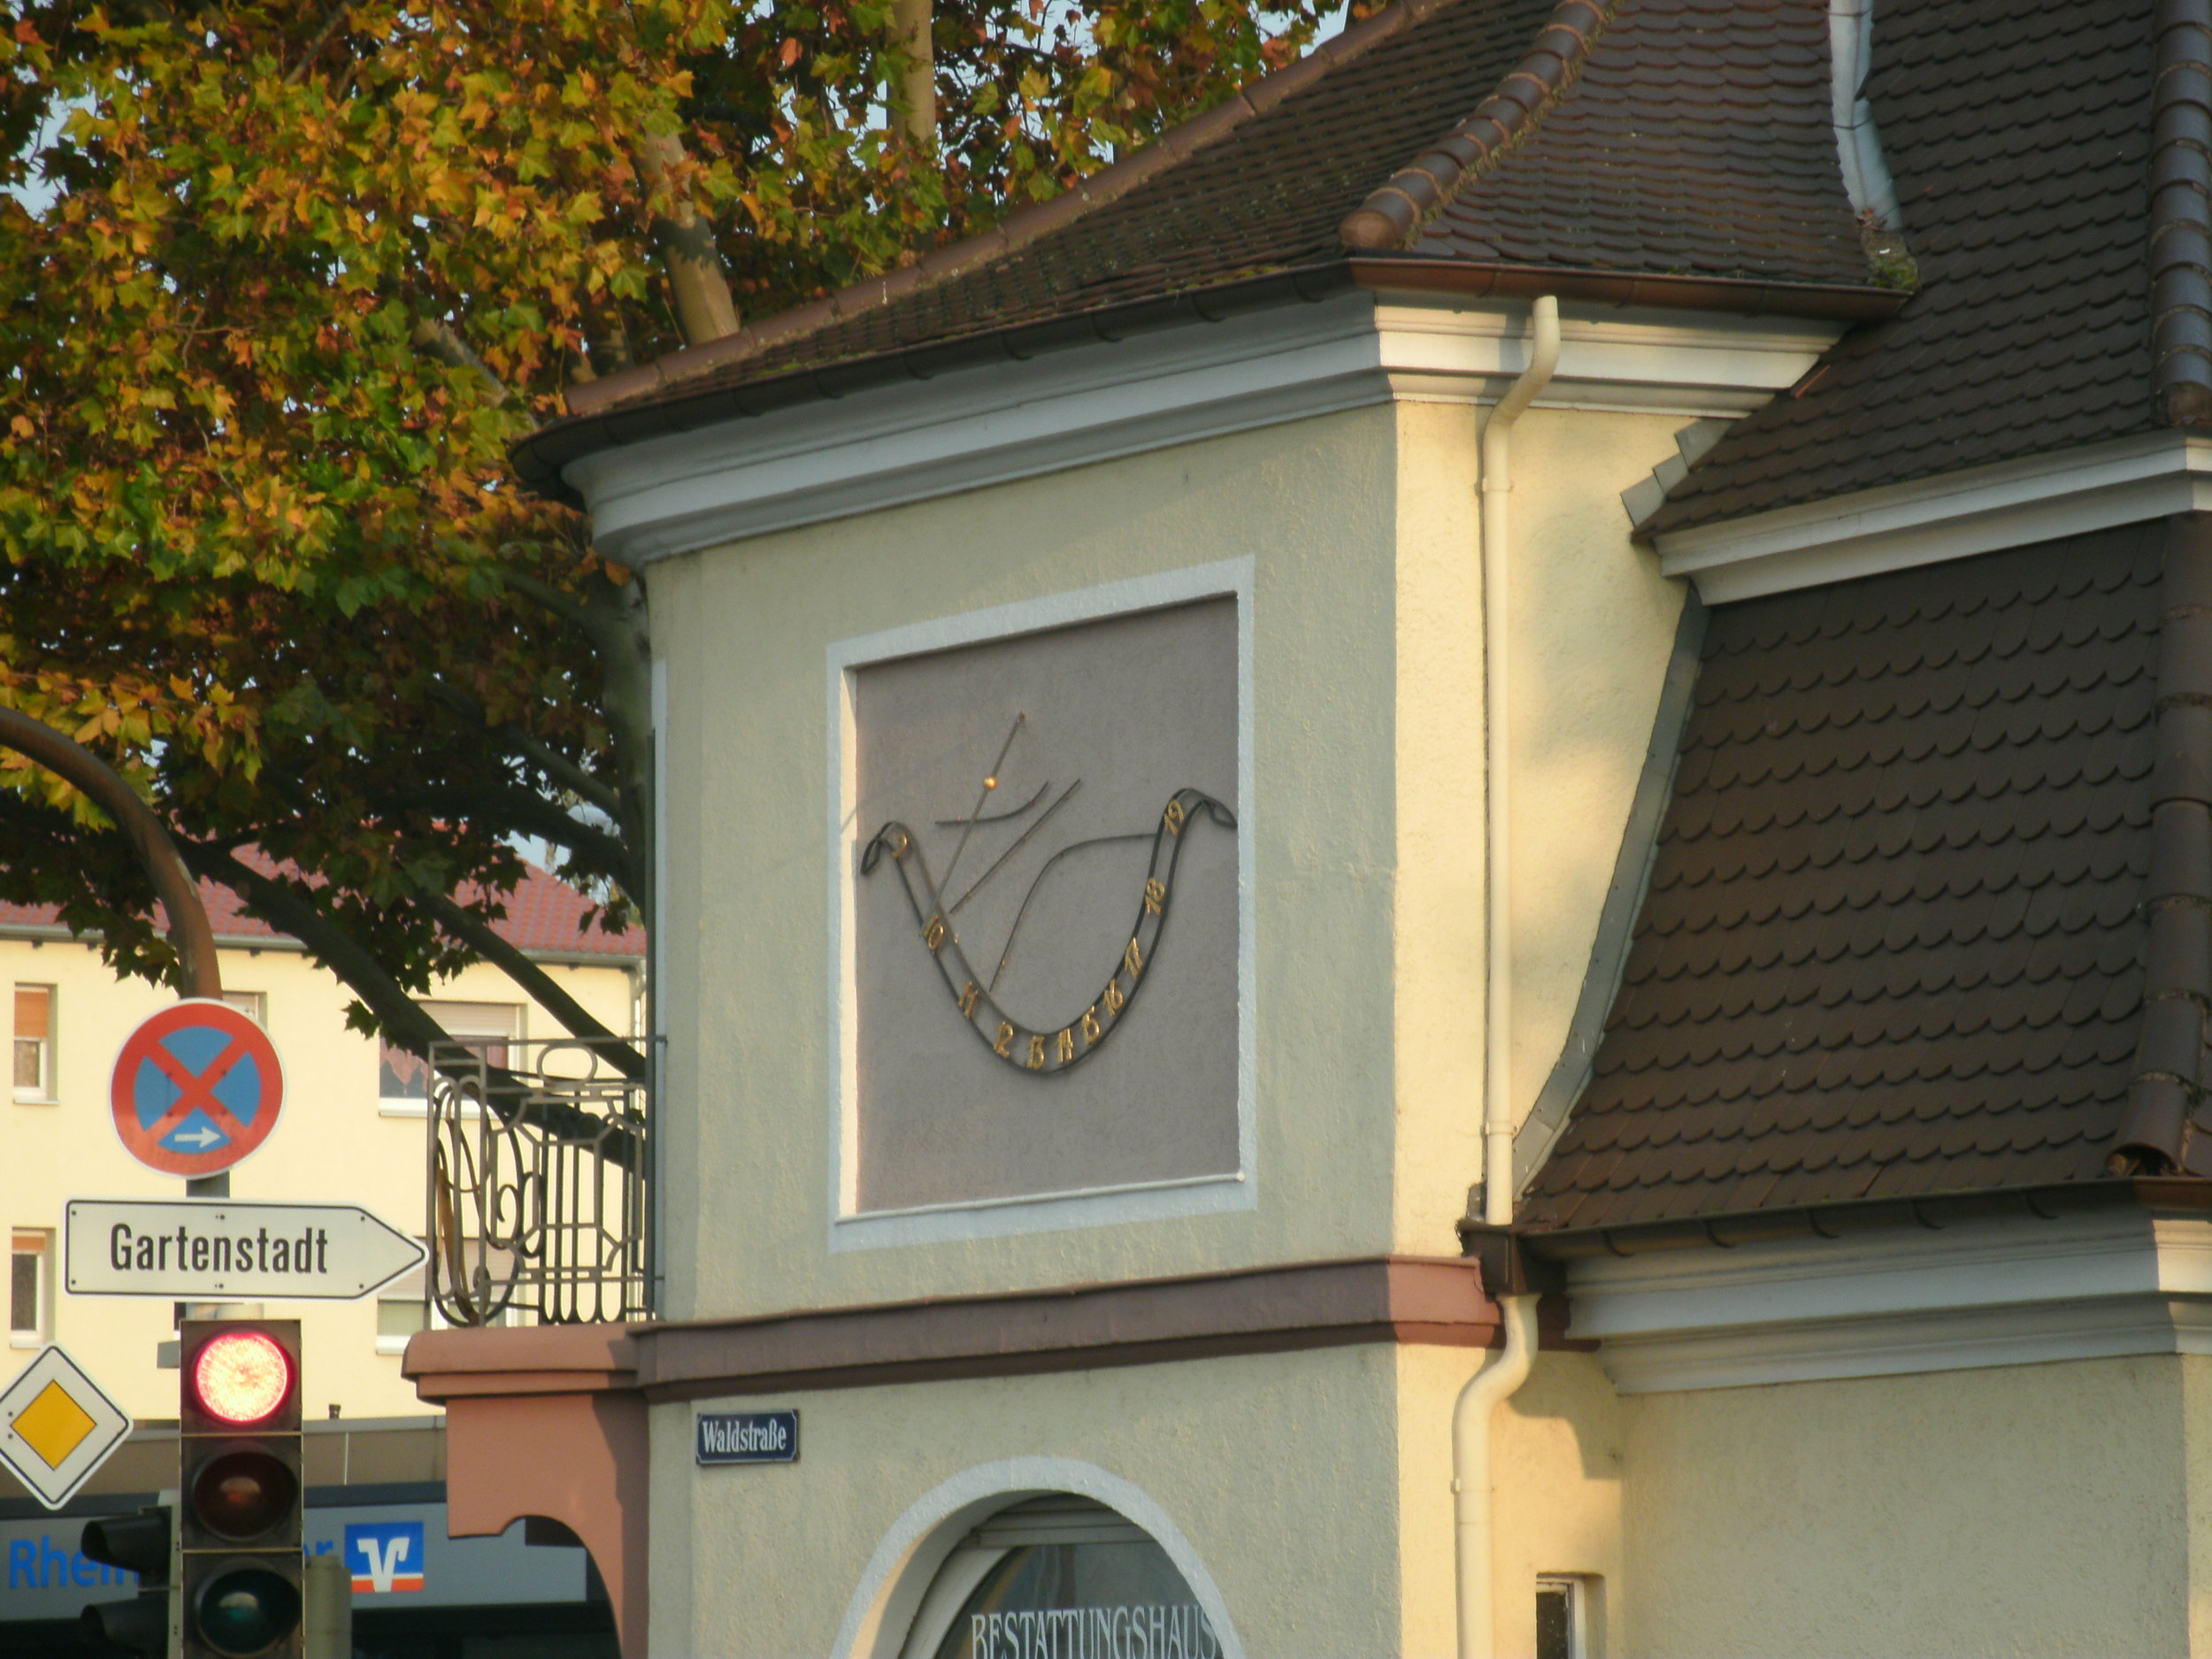 Gartenstadt,_68305_Mannheim,_Germany_-_panoramio.jpg